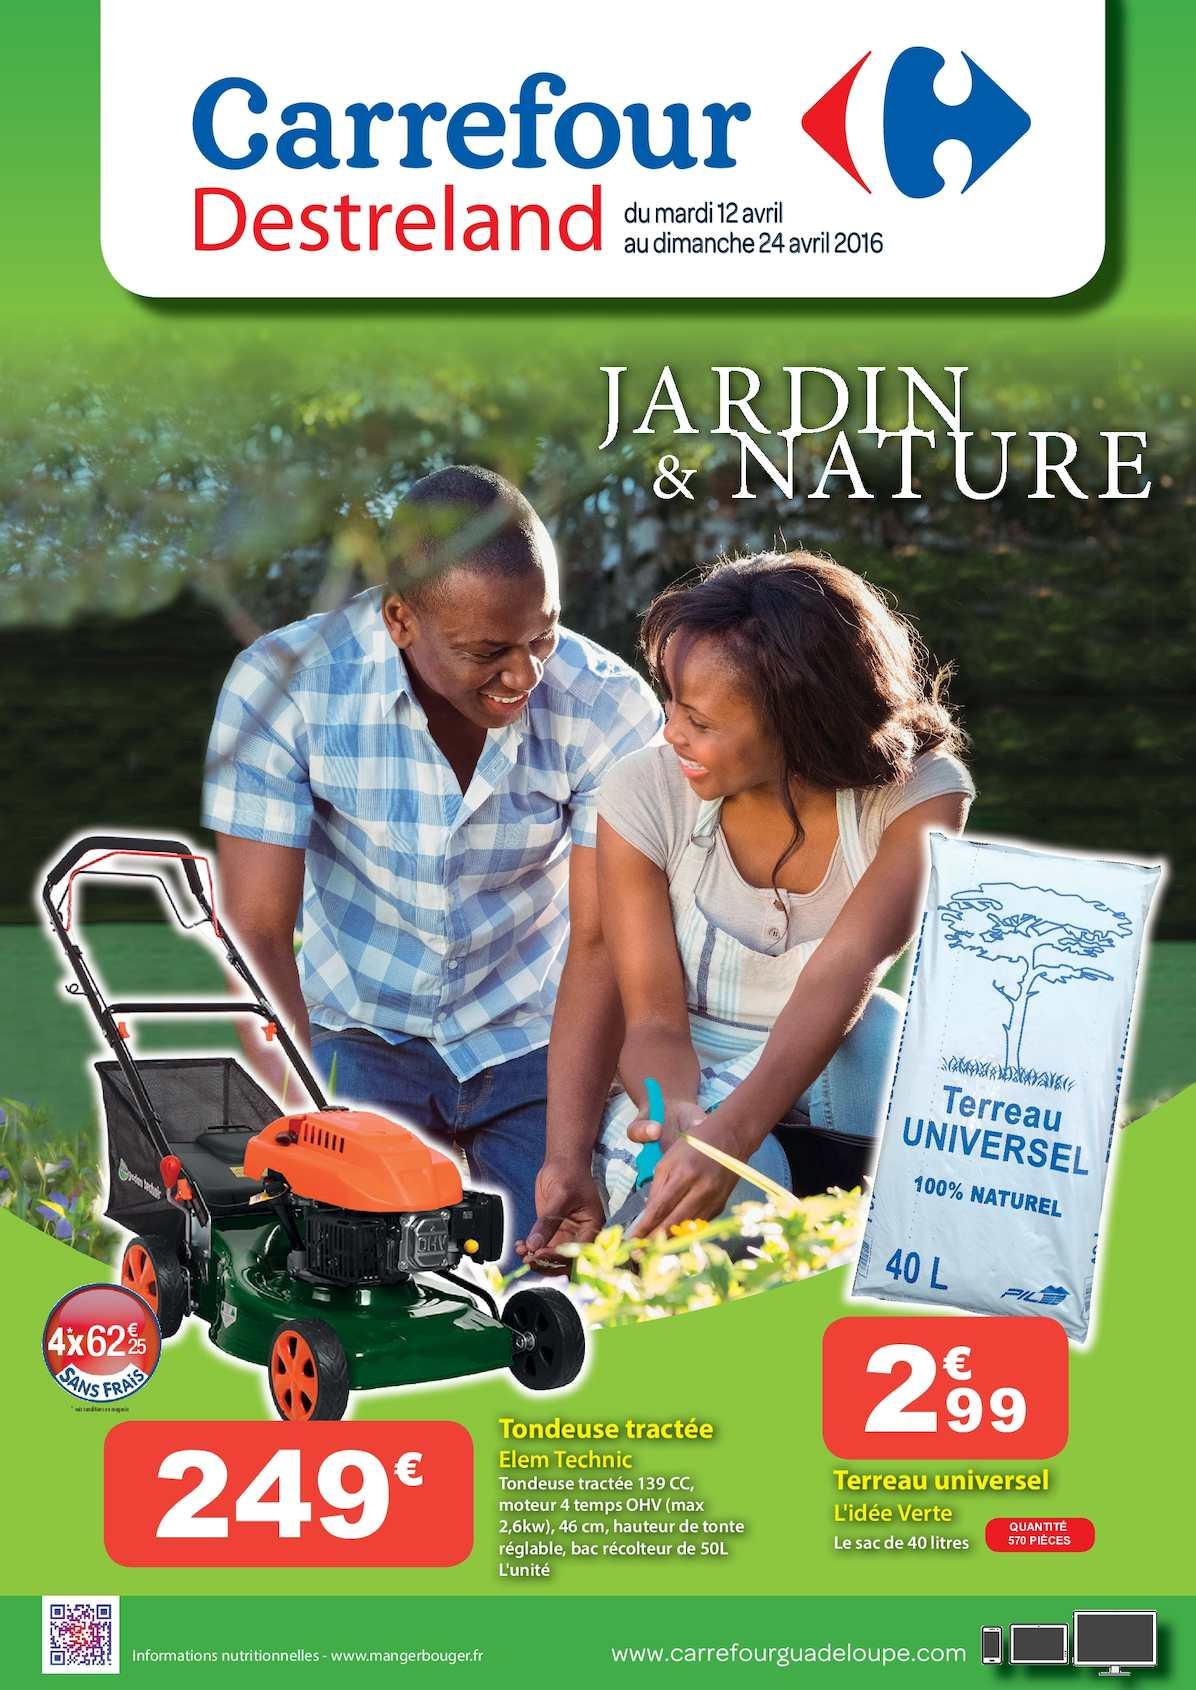 Calaméo - Carrefour Catalogue Jardin & Nature à Balancelle De Jardin Carrefour